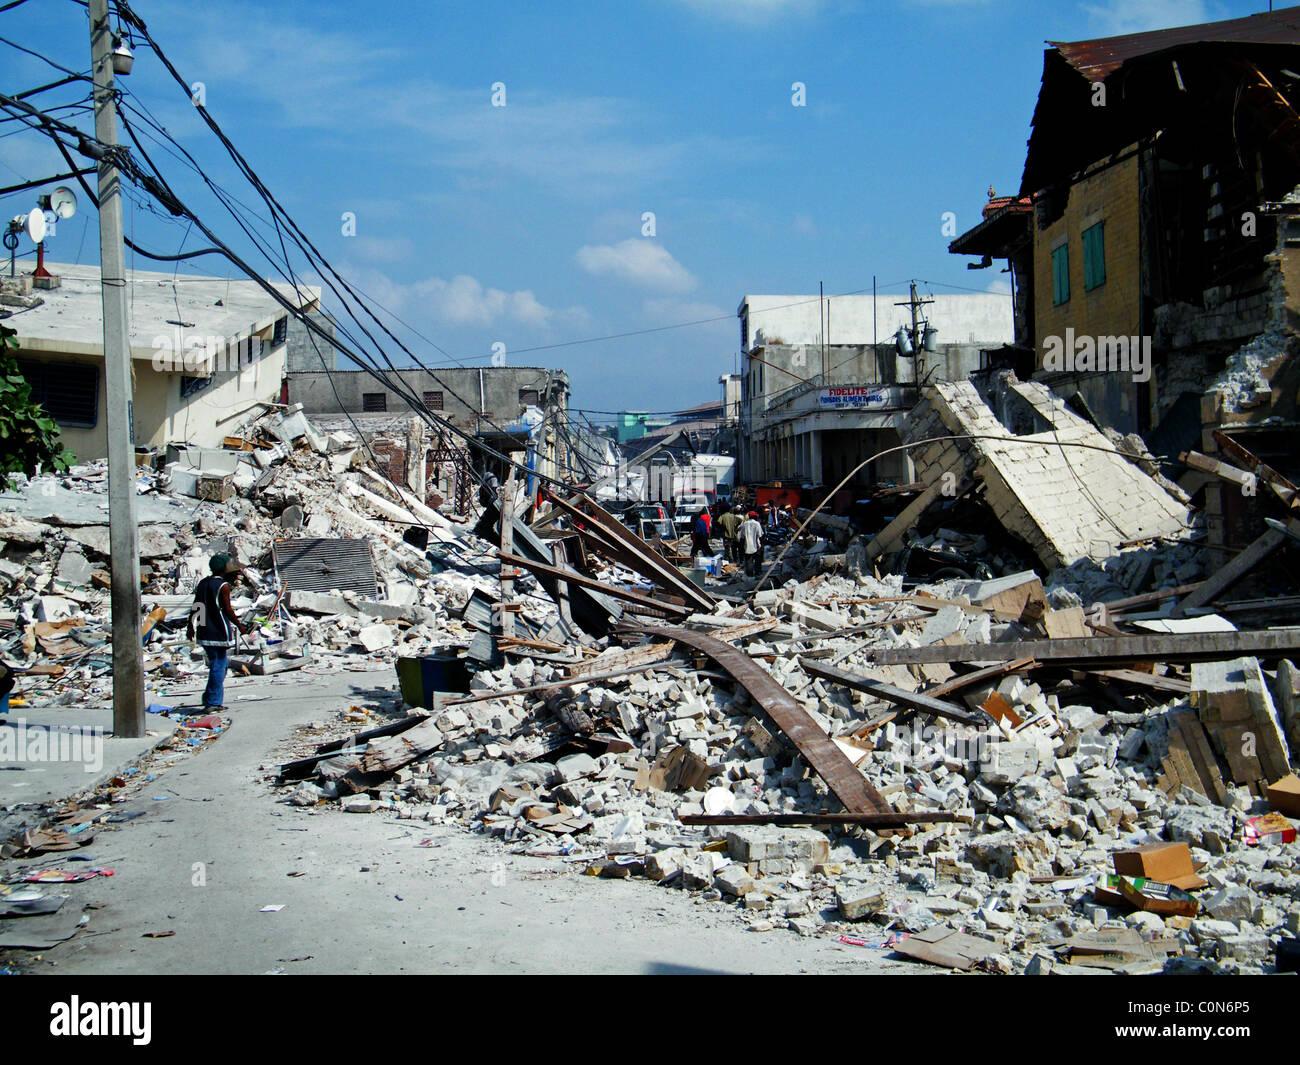 Central Port au Prince after the Haiti earthquake - Stock Image